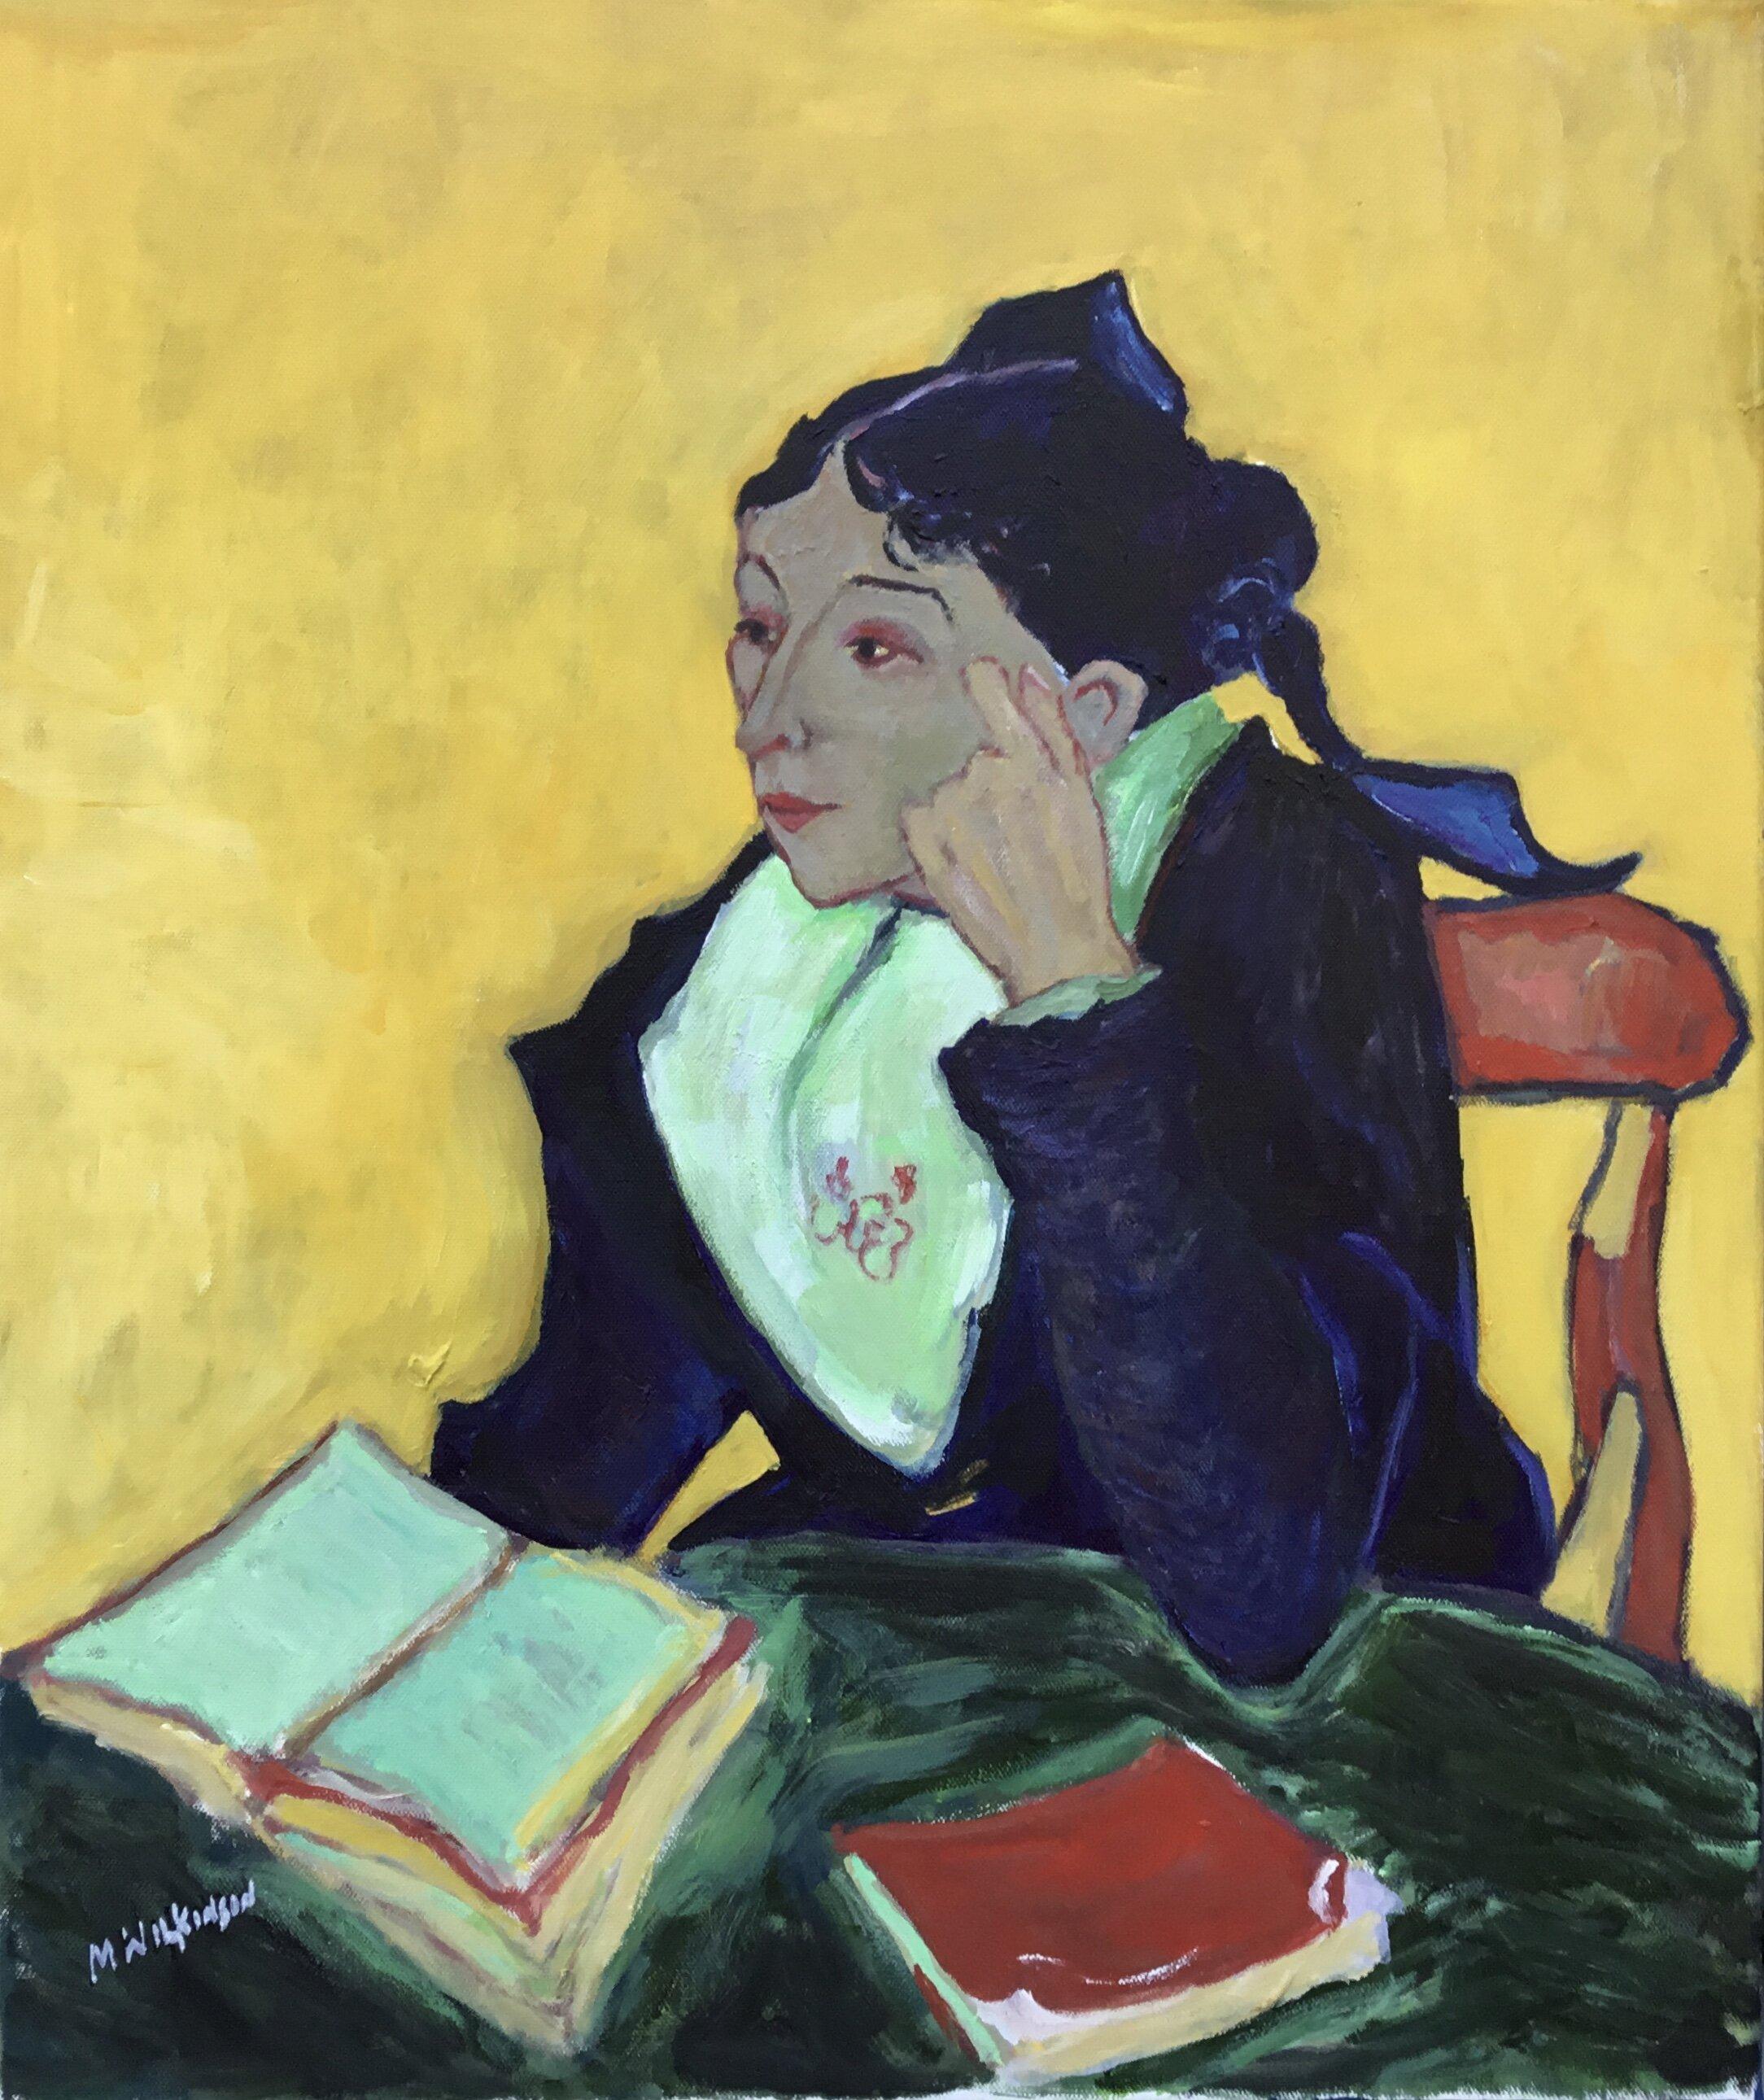 Van Gogh study / madame ginoux